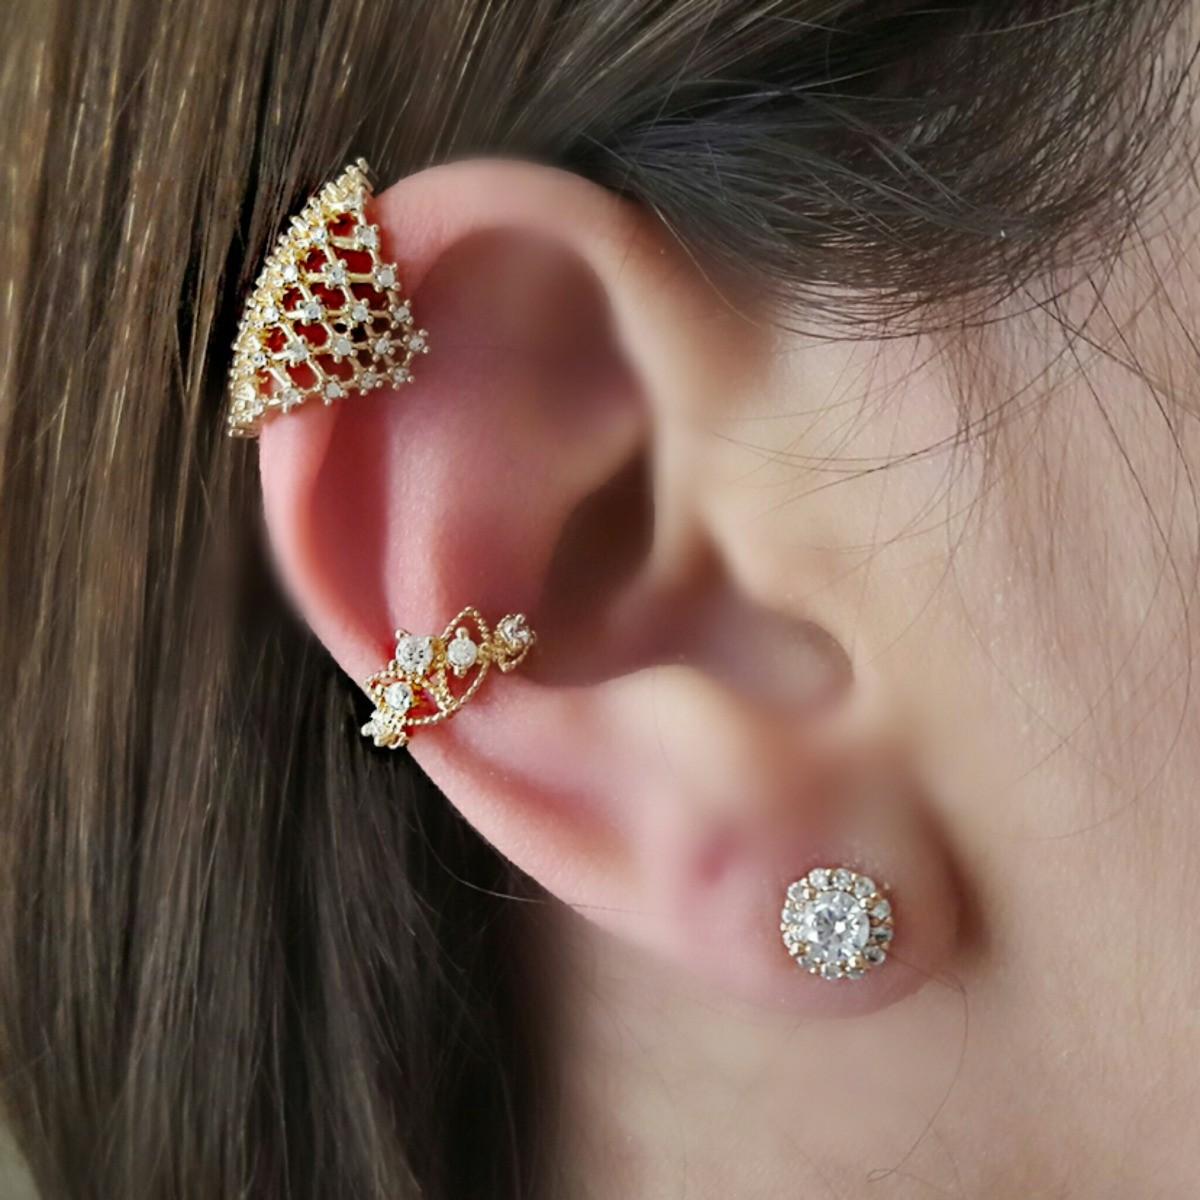 Piercing de Orelha Cravejado de Zircônia Branca Coroa Semijoia em Ouro 18K  - Soloyou